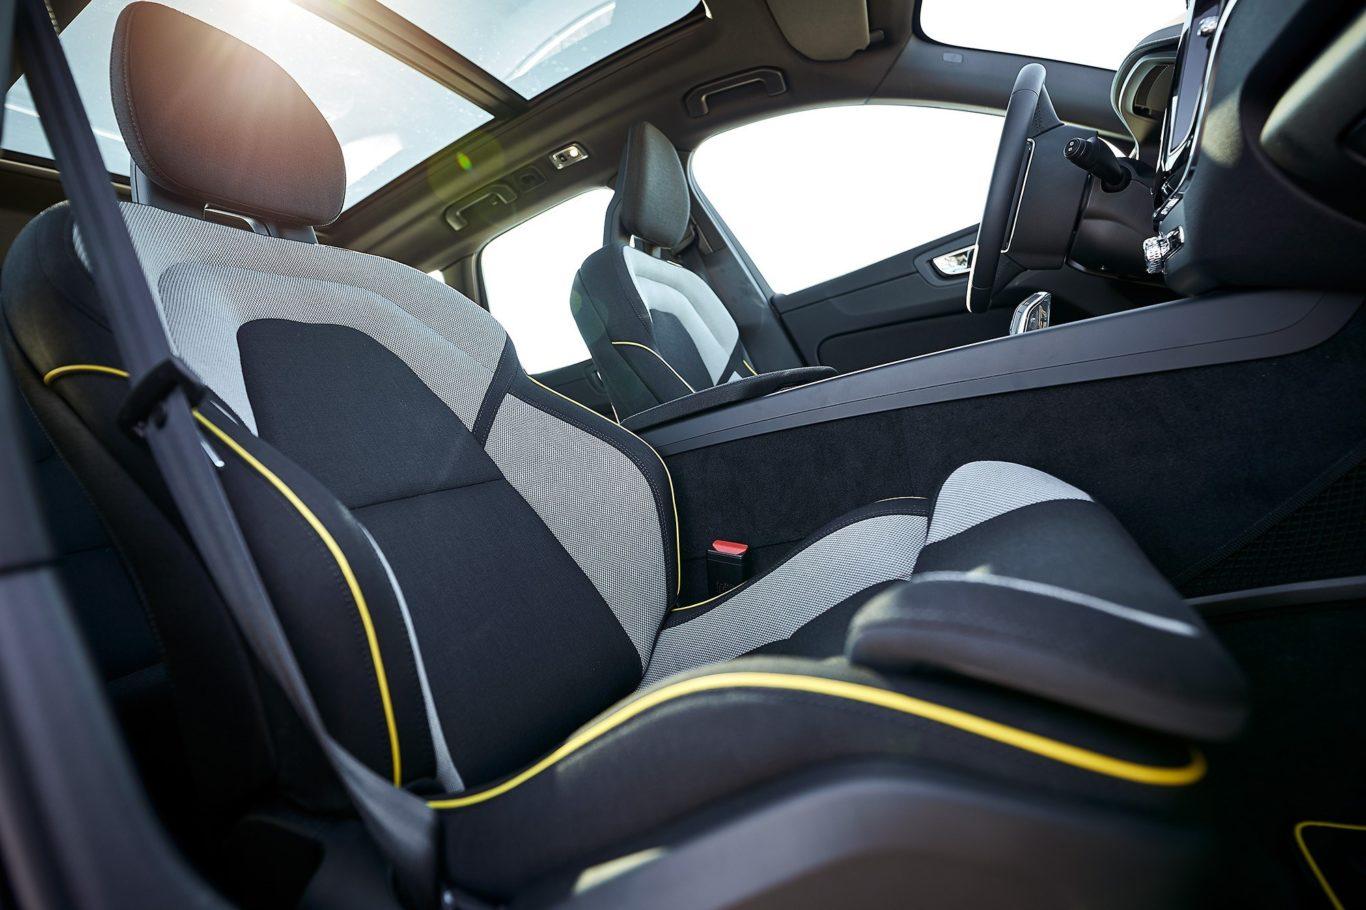 Swedish Made Car Seats